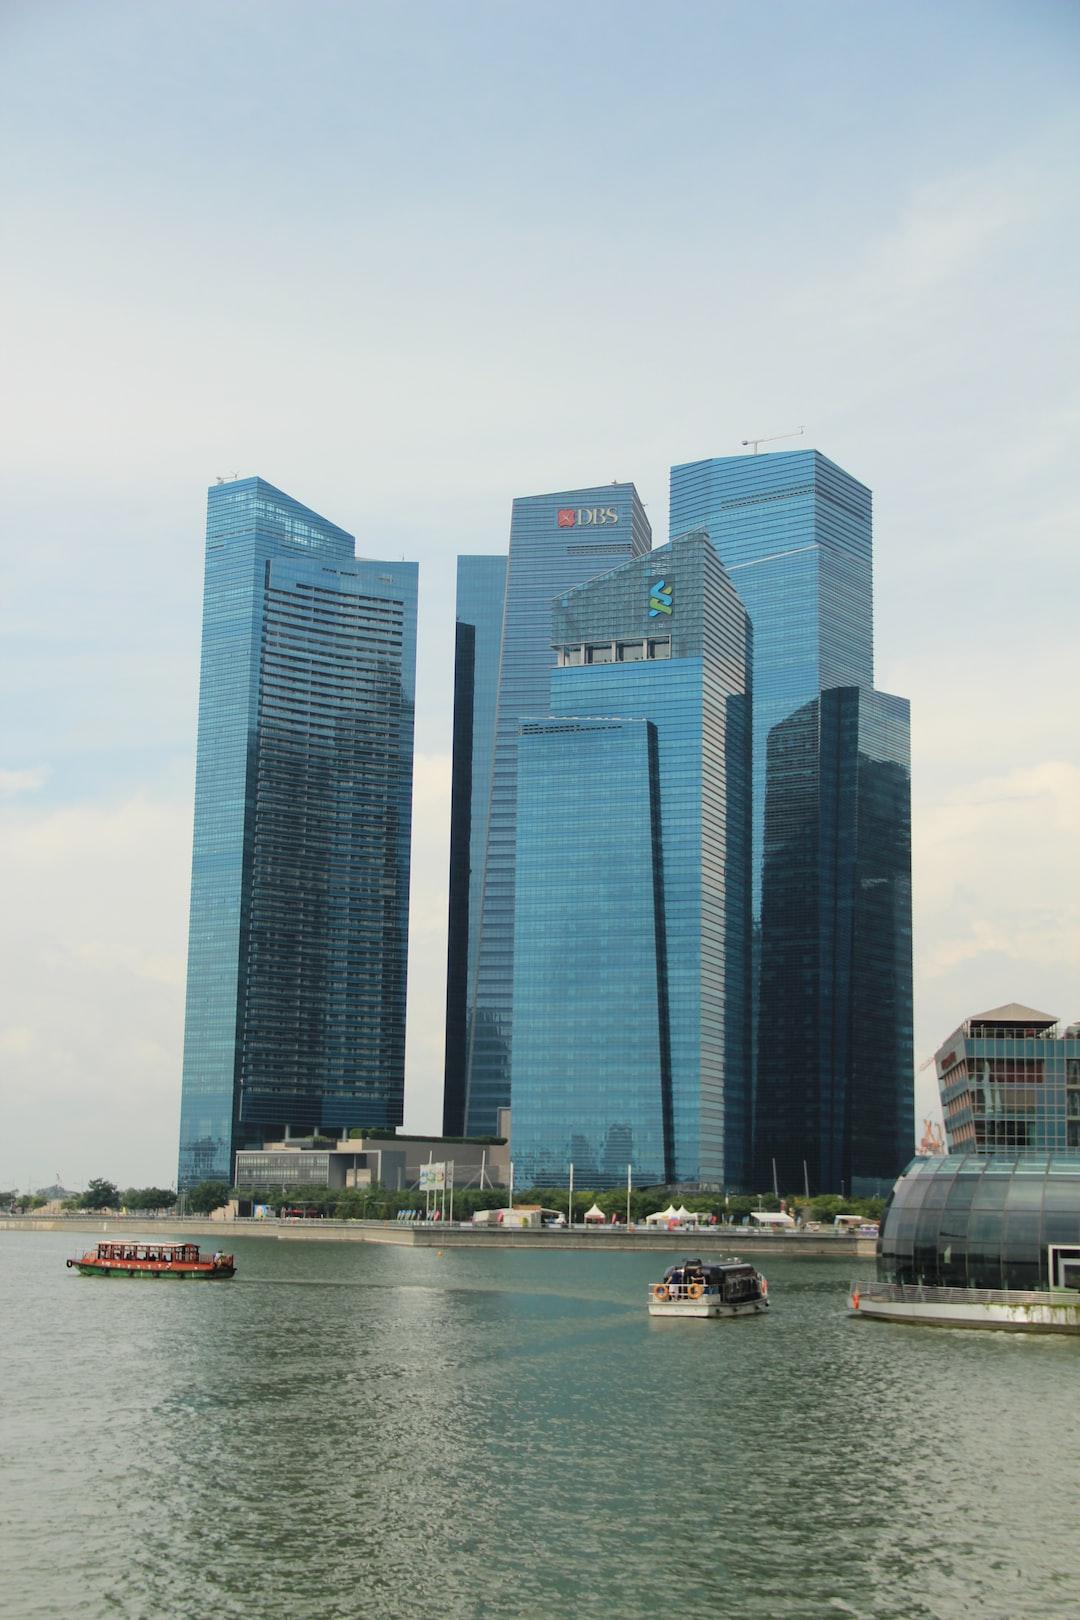 Marina Bay Financial Centre Singapore